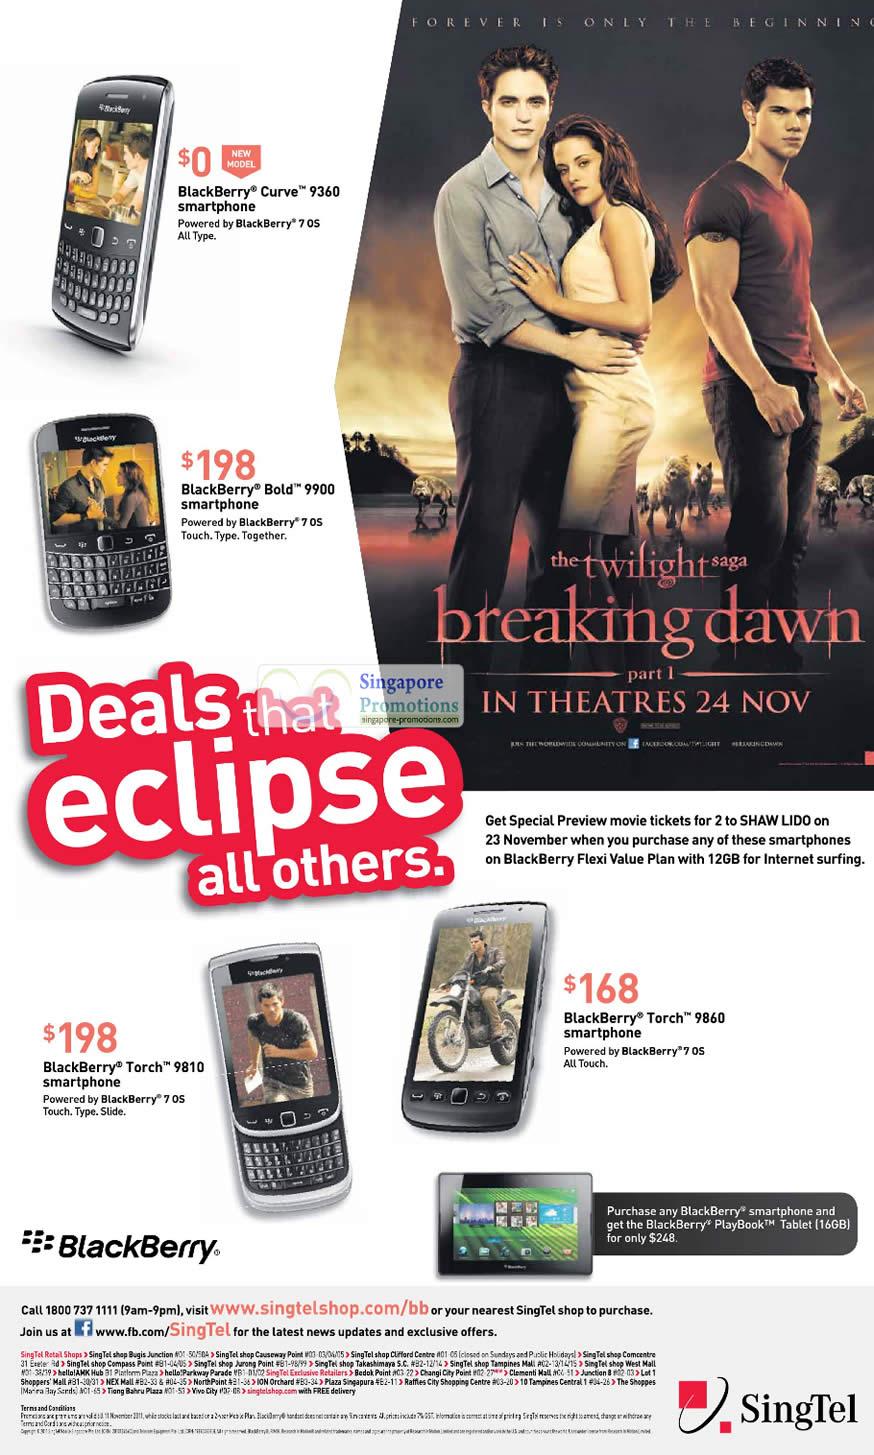 Blackberry Curve 9360, Blackberry Bold 9900, Blackberry Torch 9810, Blackberry Torch 9860